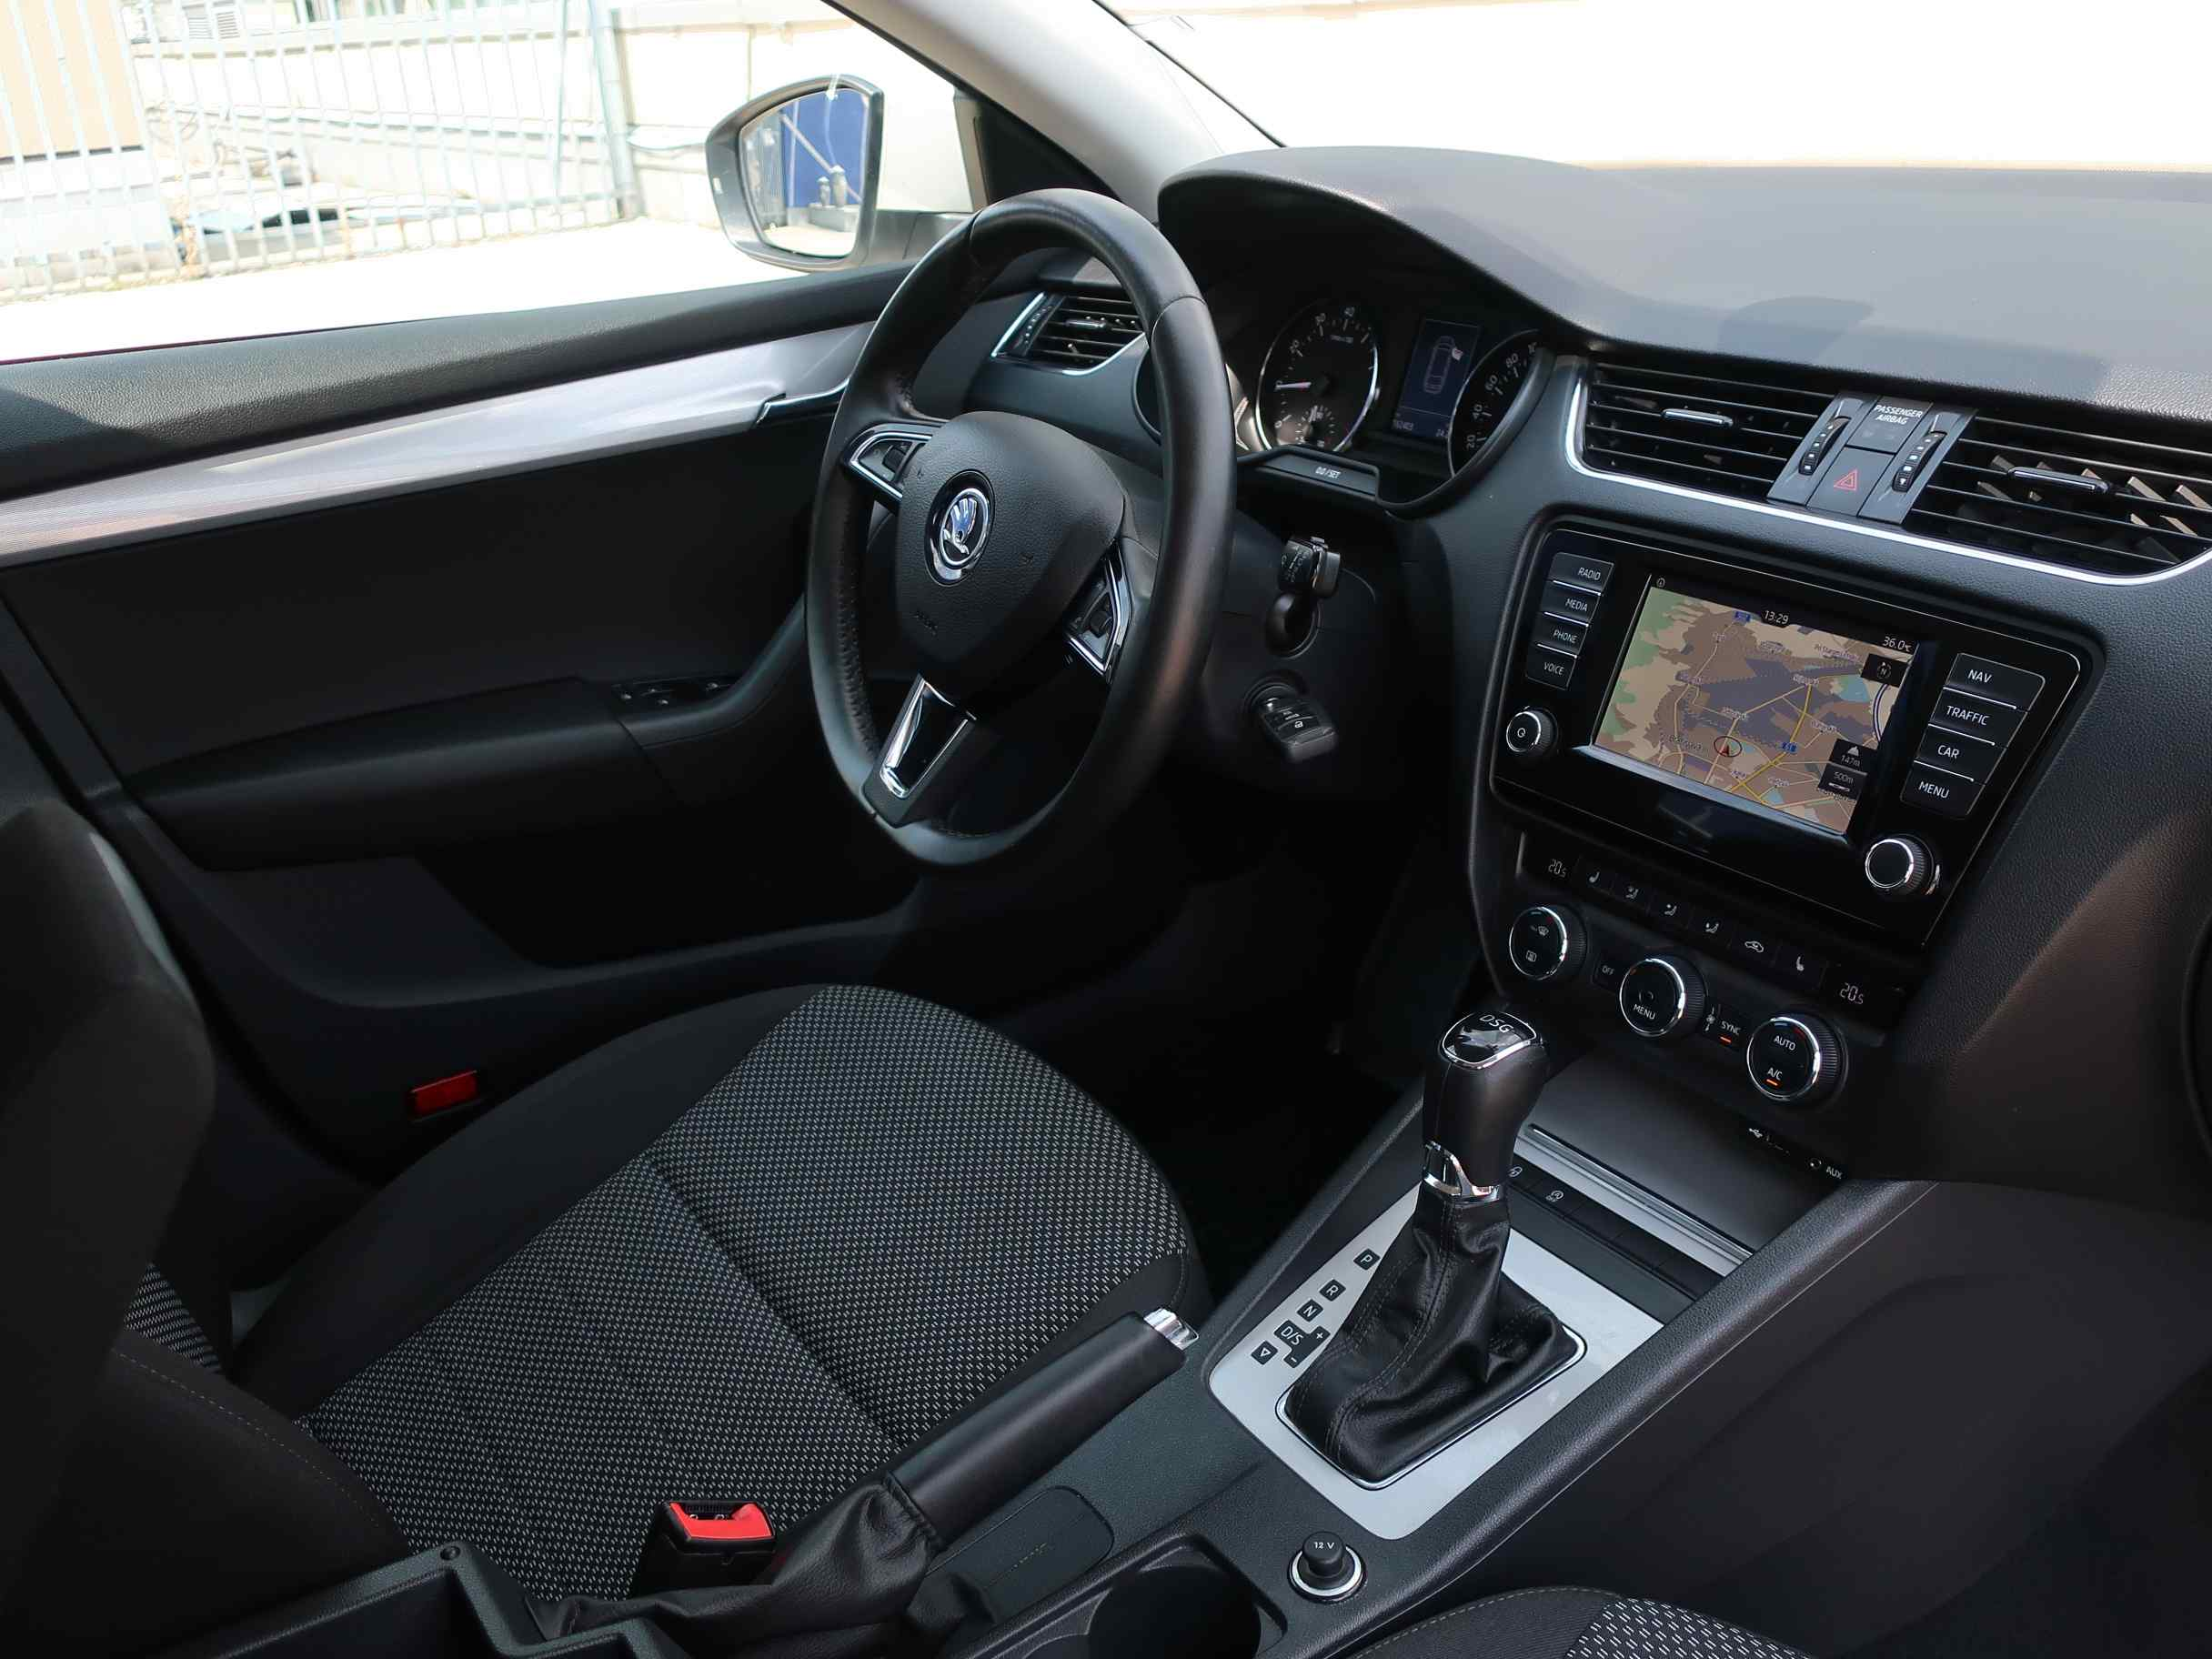 Škoda Octavia III Combi 1.4 TSI Ambition DSG